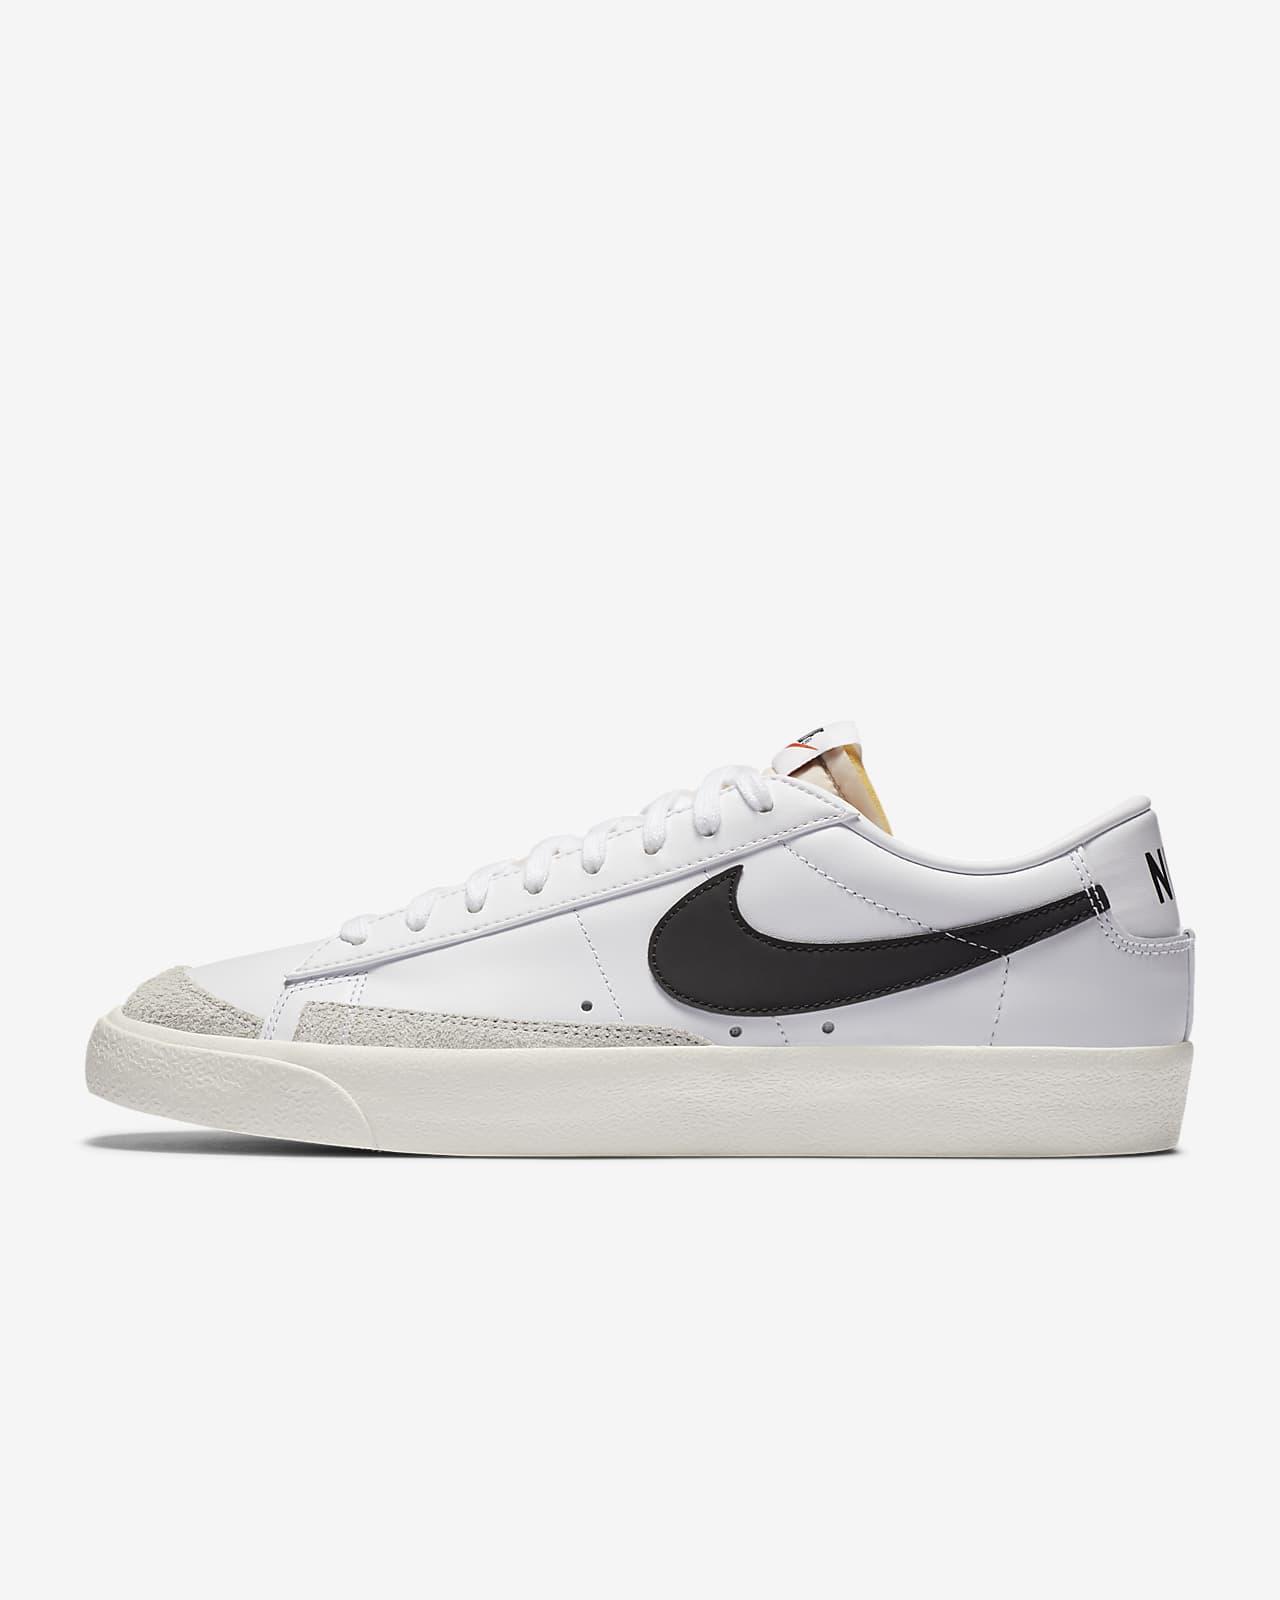 Nike Blazer 低筒 '77 Vintage 男鞋